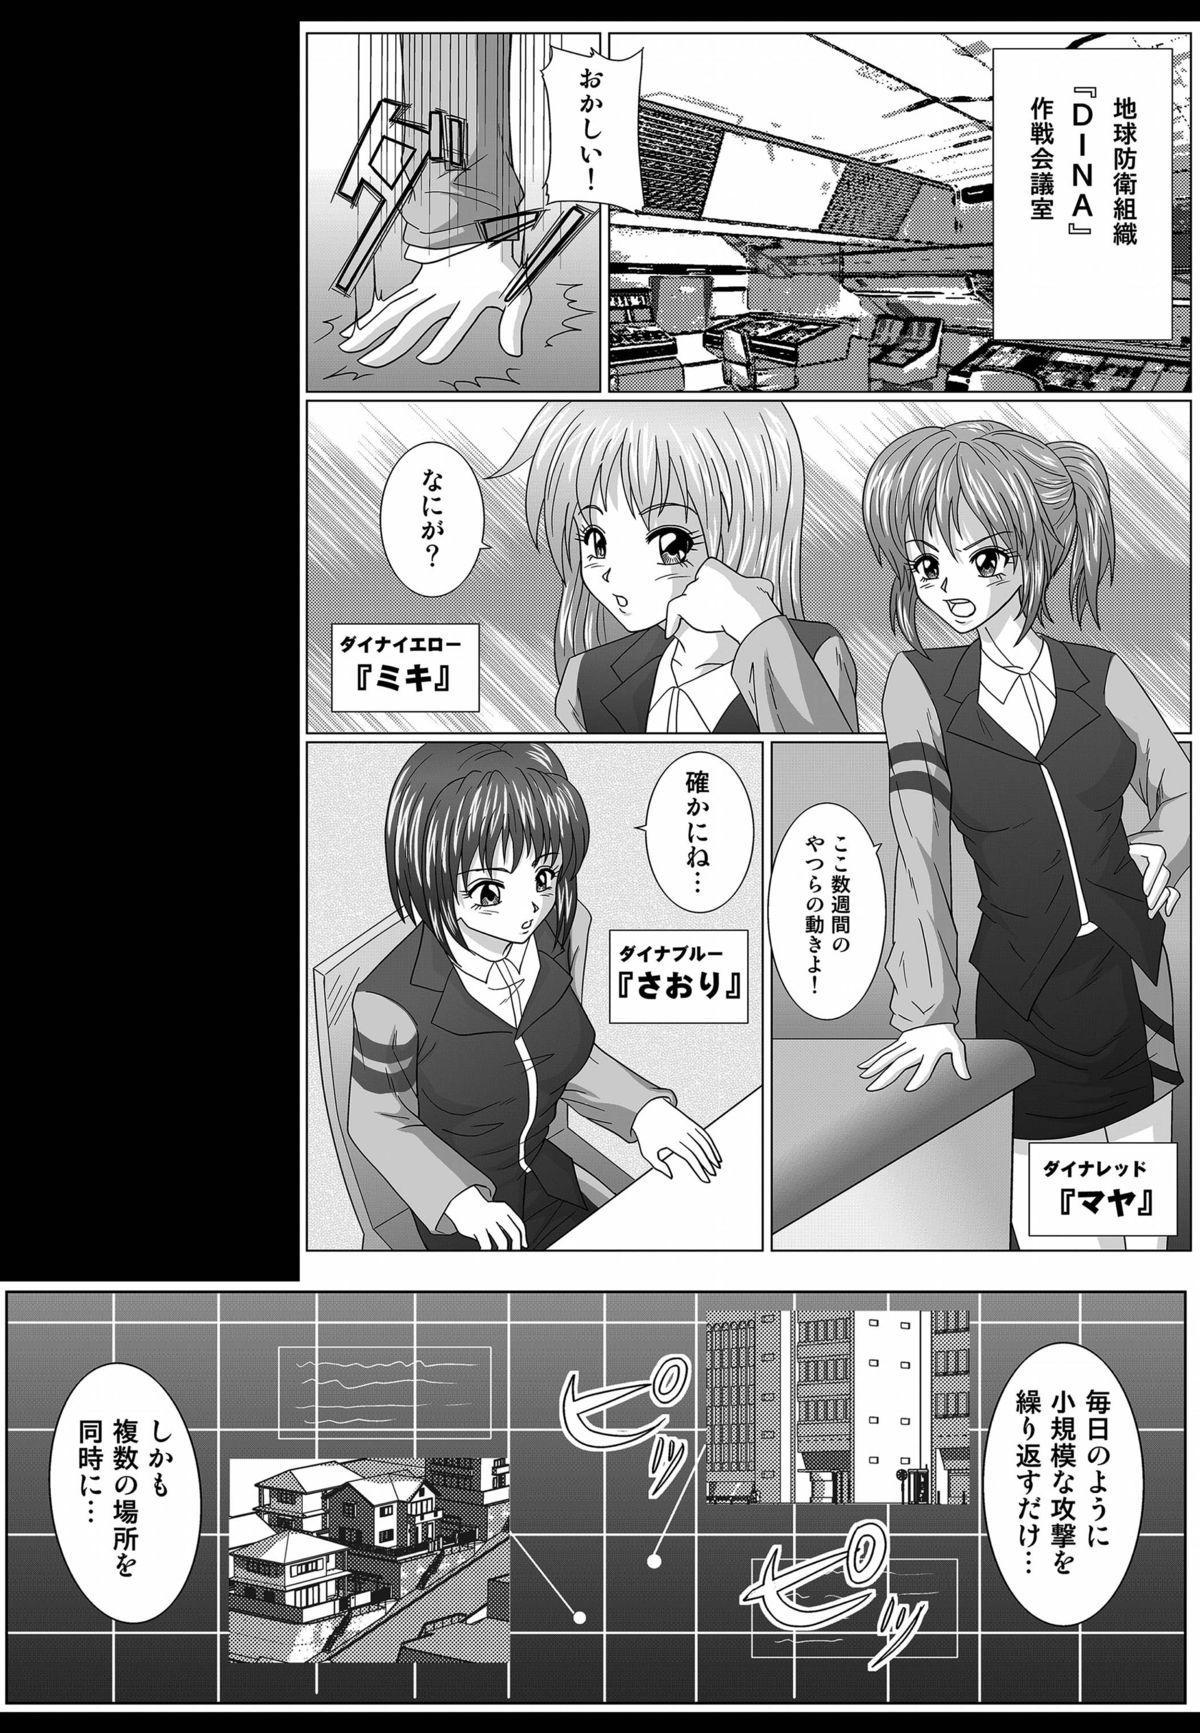 [Macxe's (monmon)] Tokubousentai Dinaranger ~Heroine Kairaku Sennou Keikaku~ Vol.01/02/03 (Renkaban) [Digital] 119